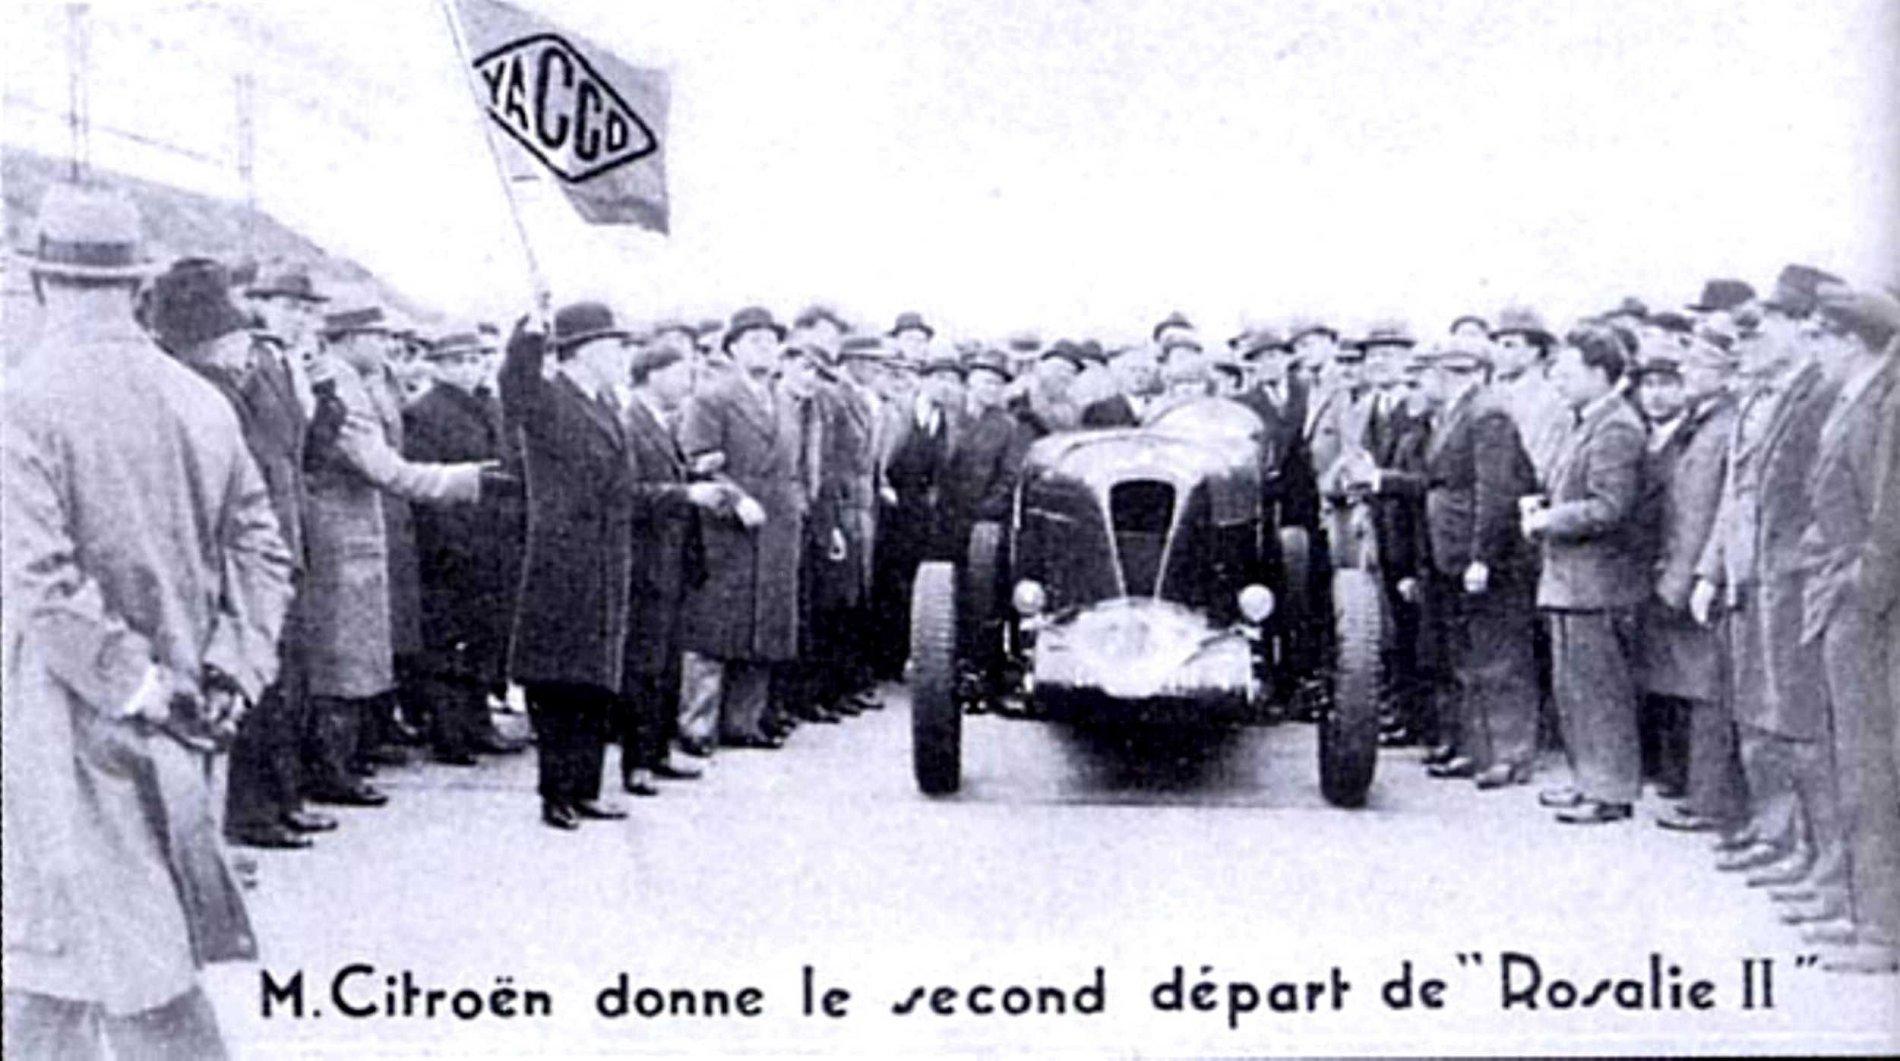 1932 Rosali II